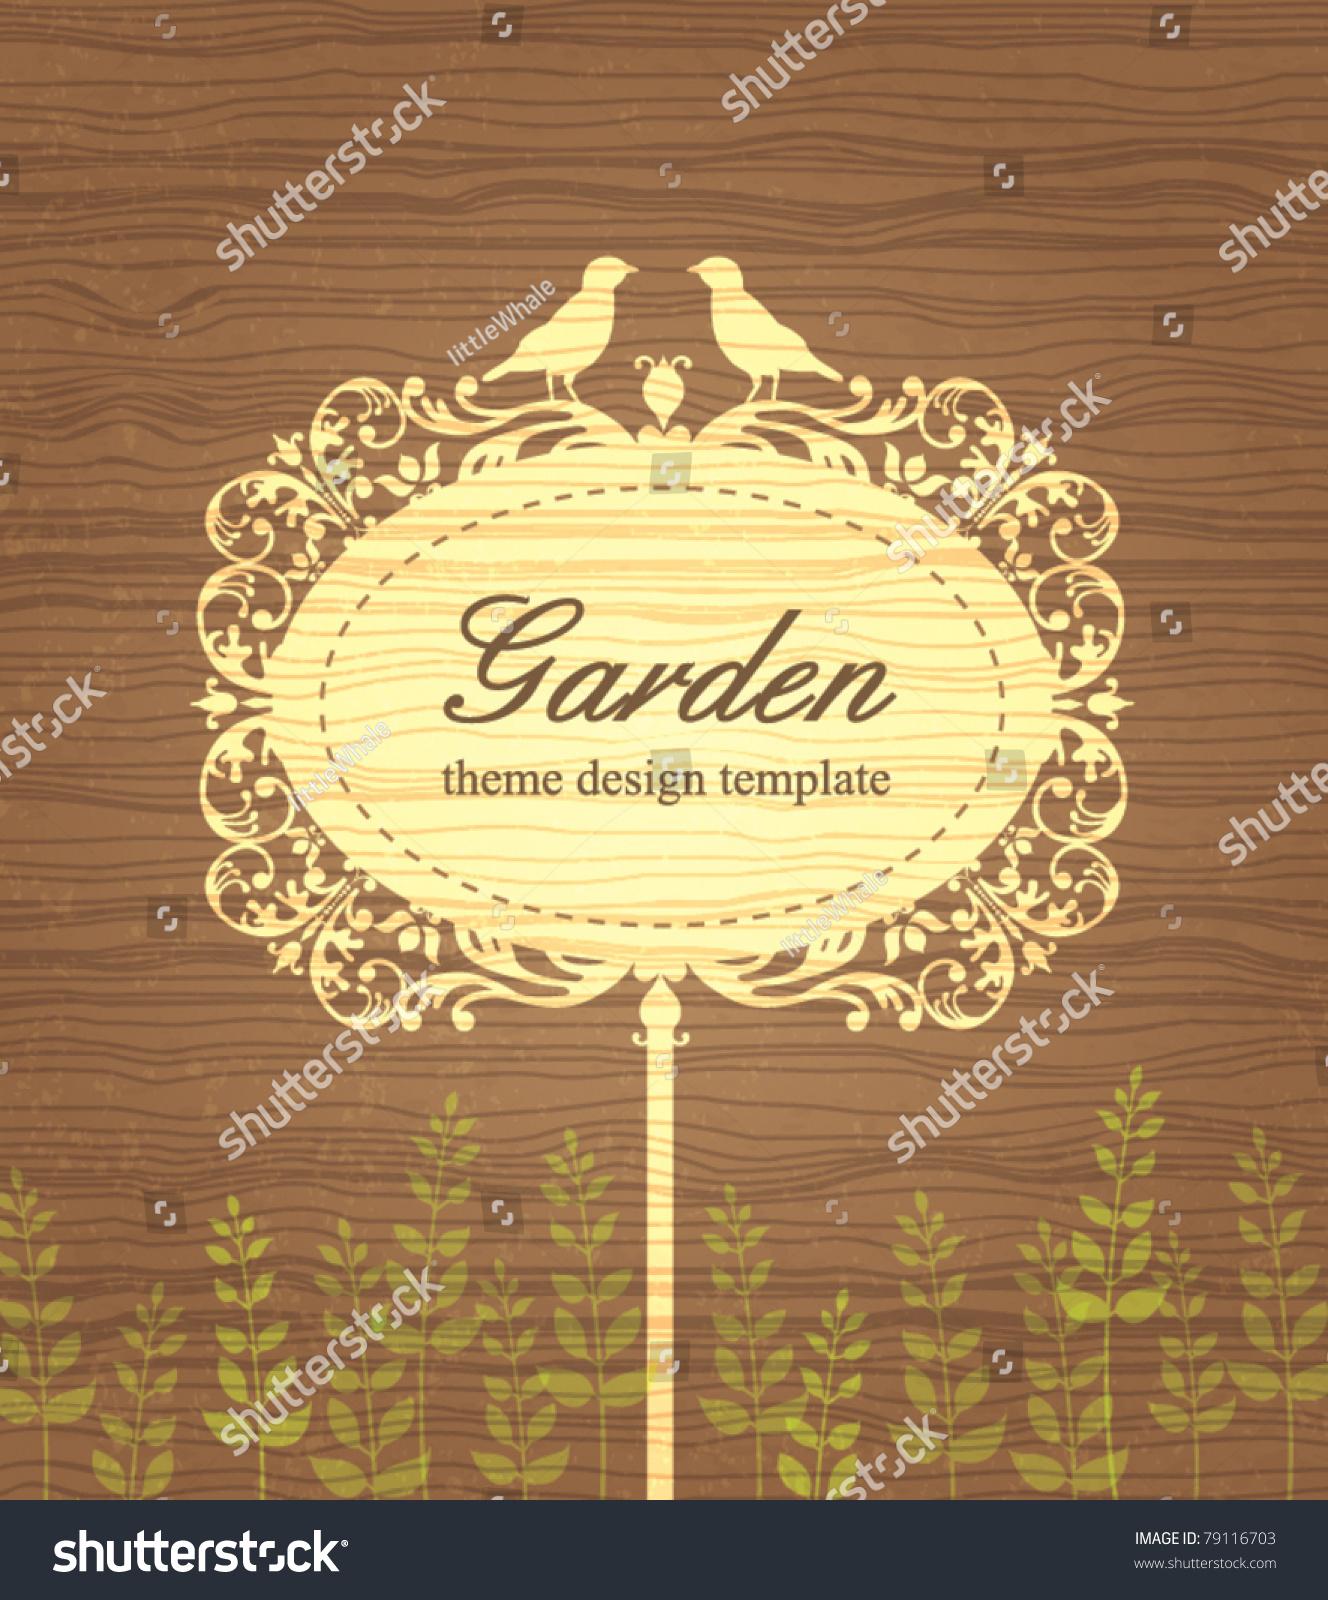 Garden Stock Image Image Of Design: Garden Theme Design Template Vintage Wood Stock Vector